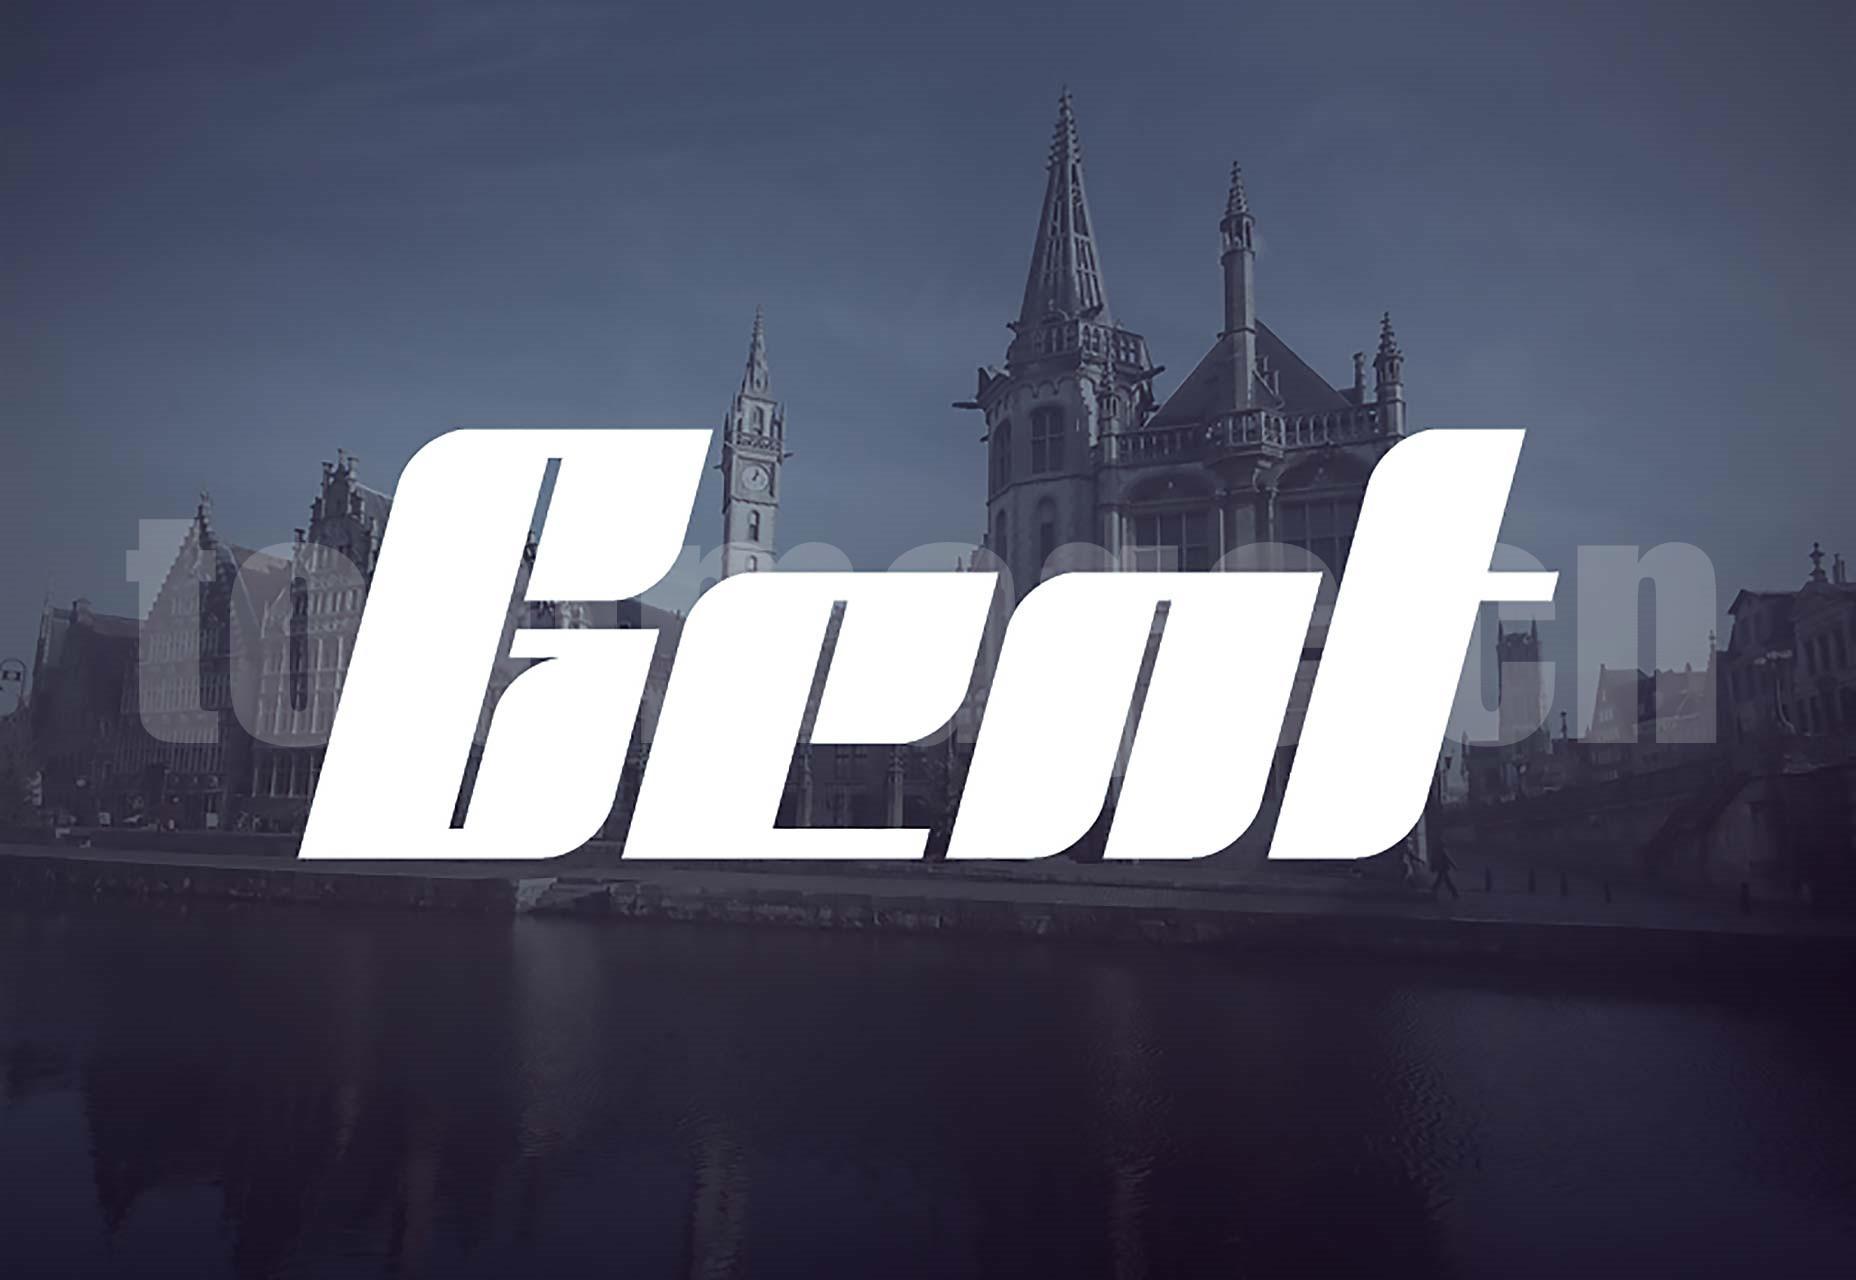 Gent创意海报 经典优雅 logo英文字体下载